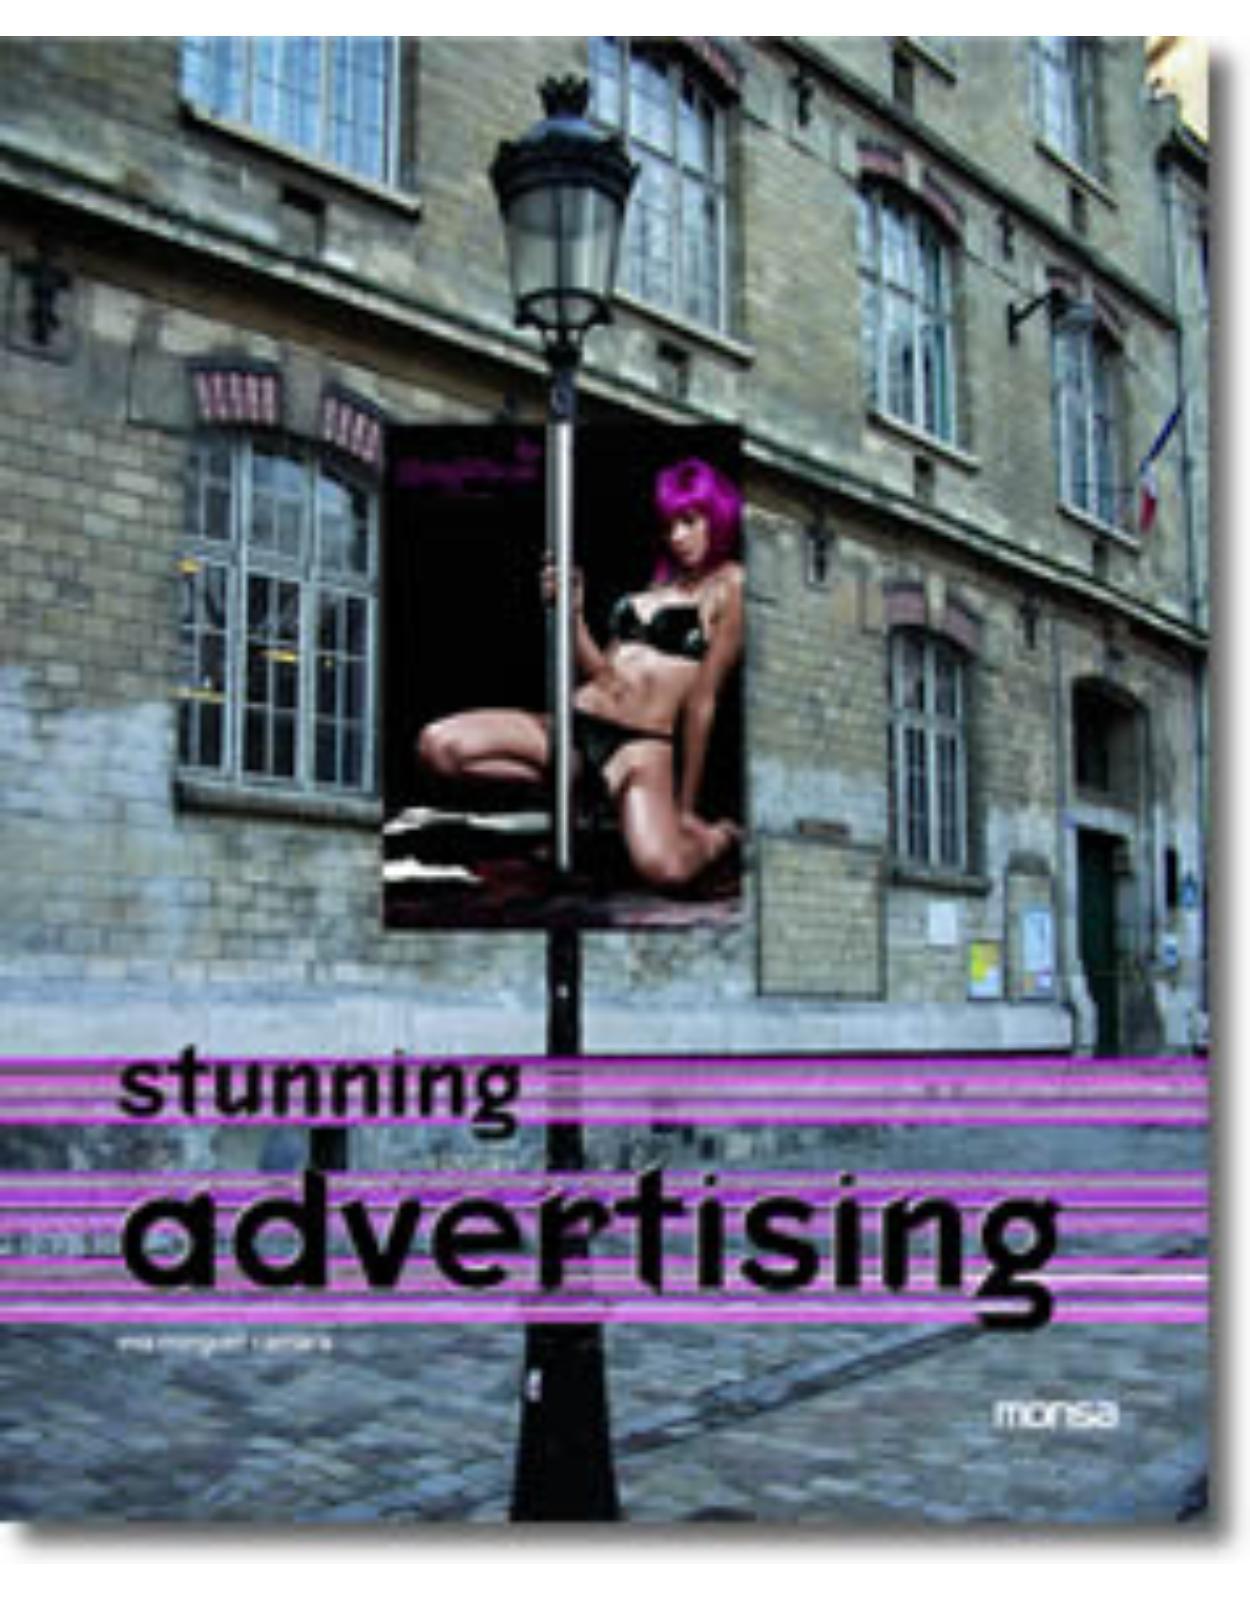 Stunning advertising